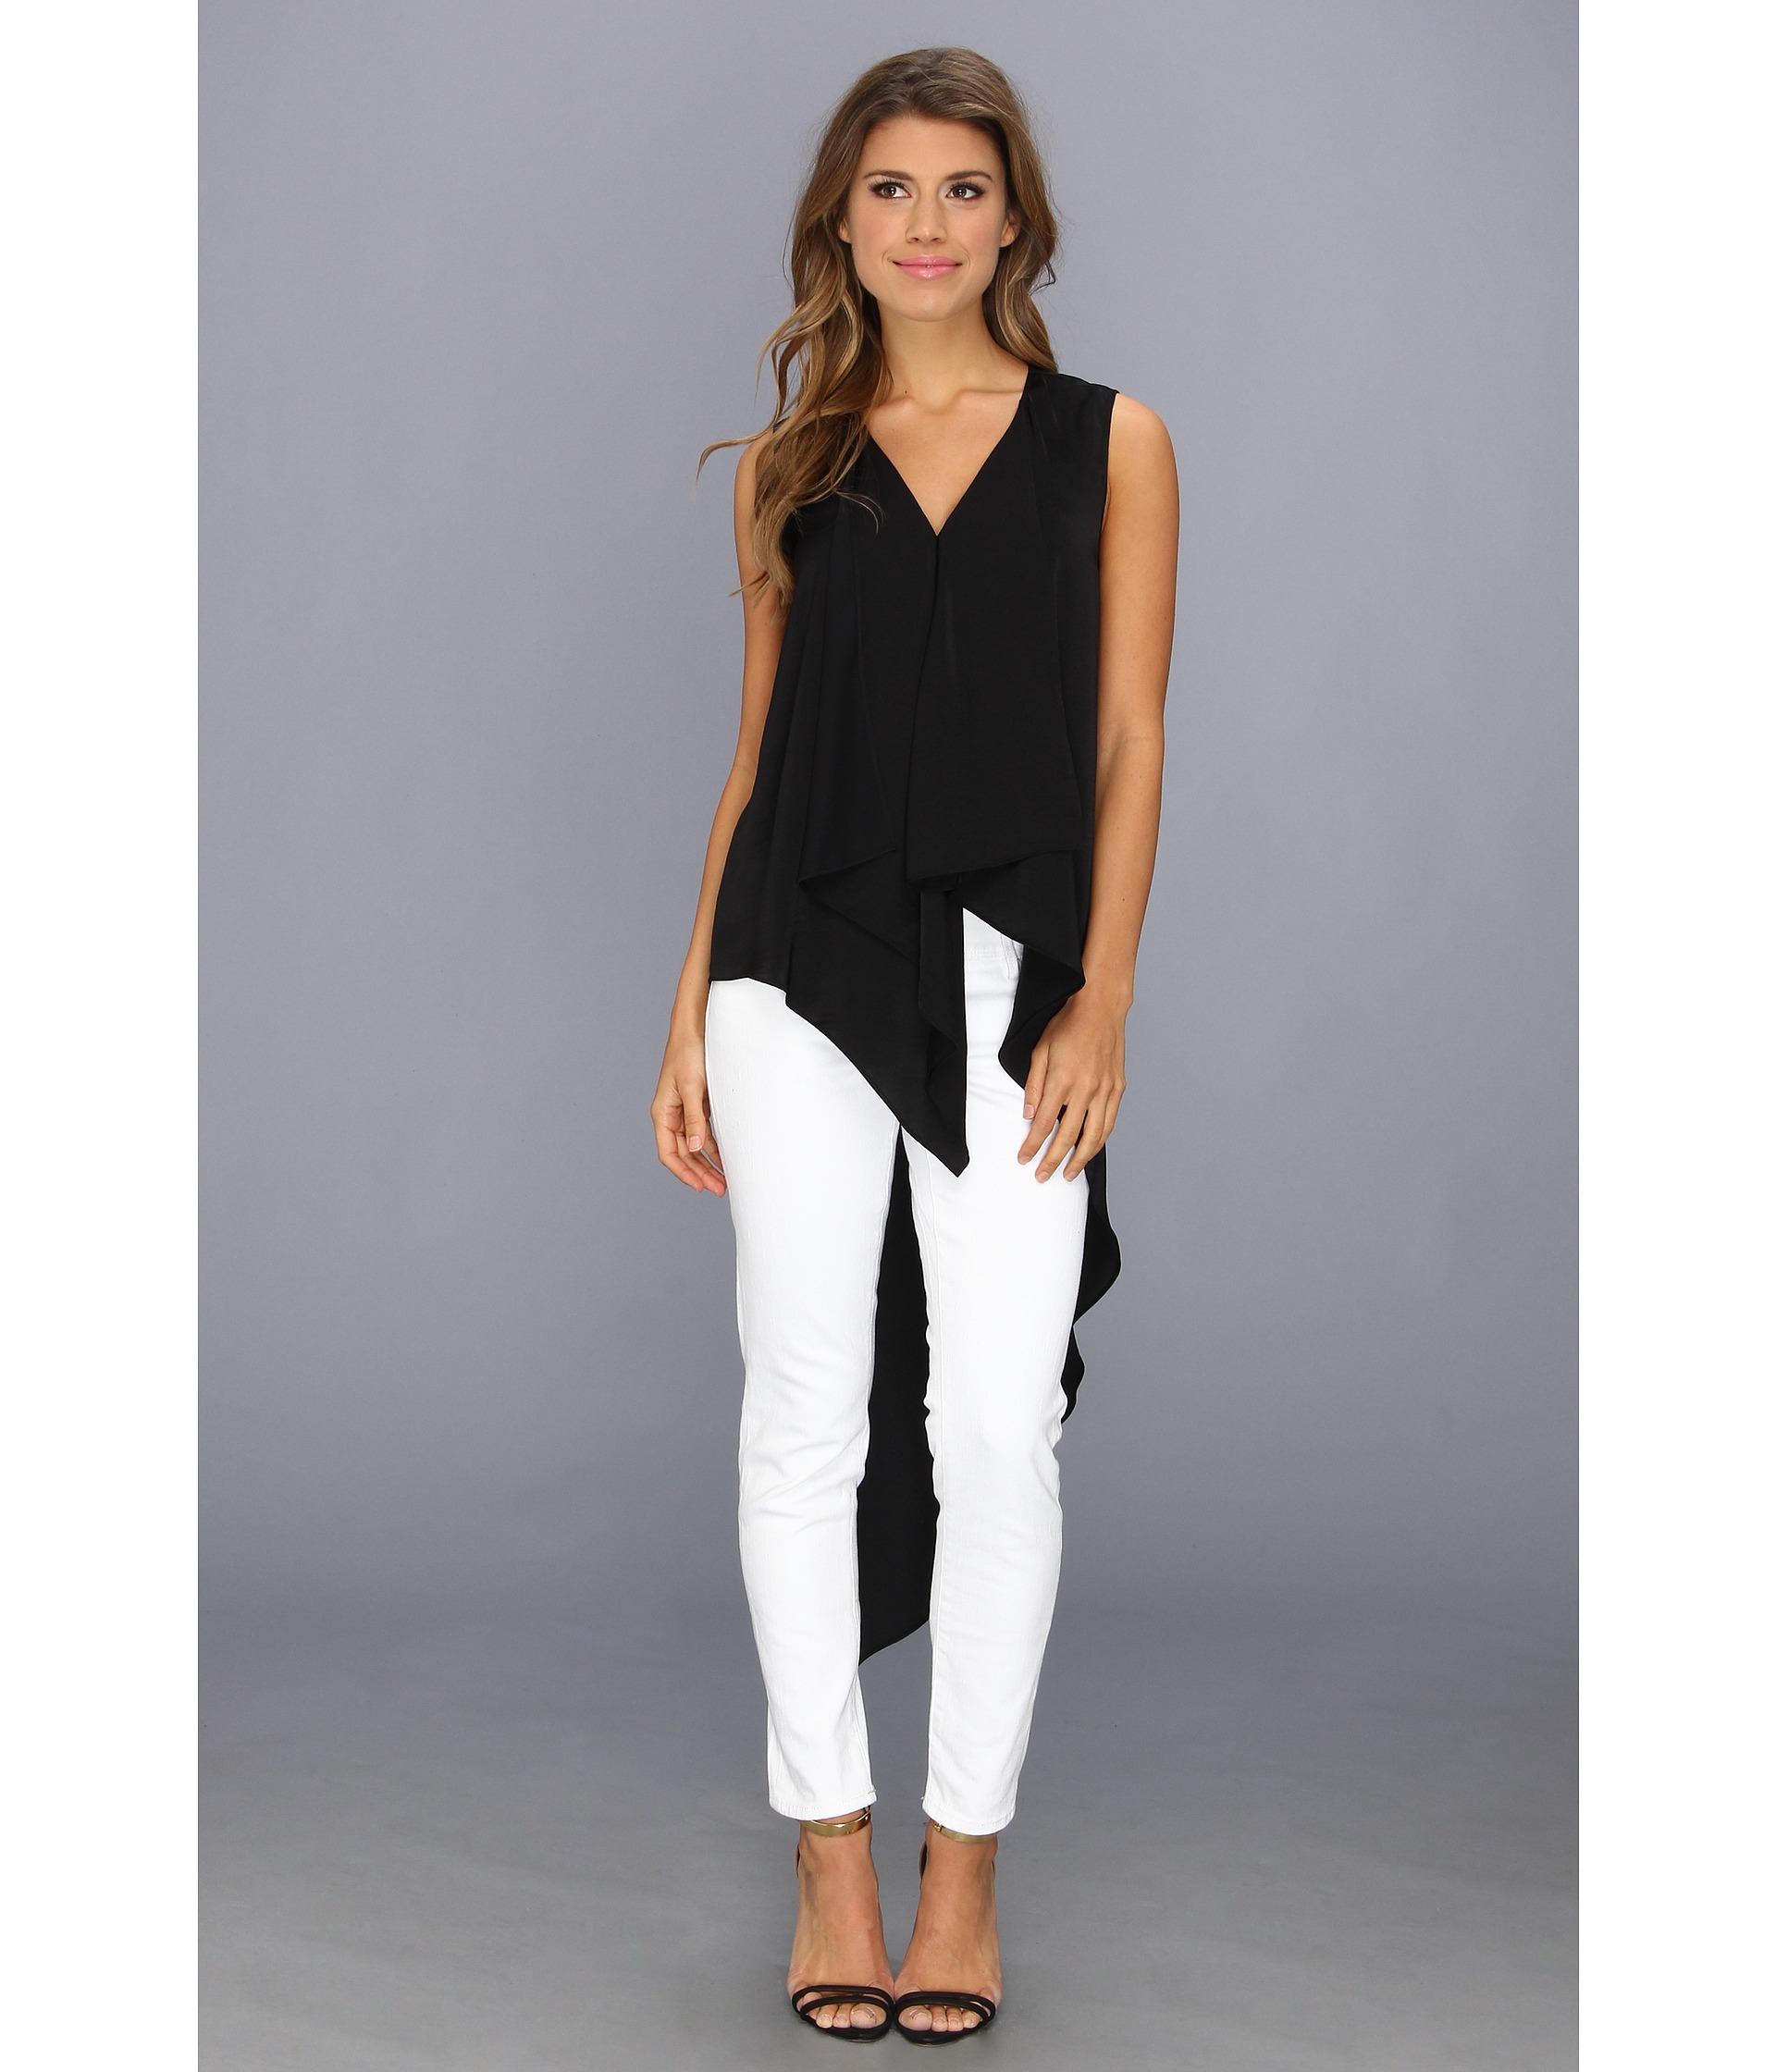 Bcbgmaxazria Cyprein Drape Tunic Top in Black | Lyst